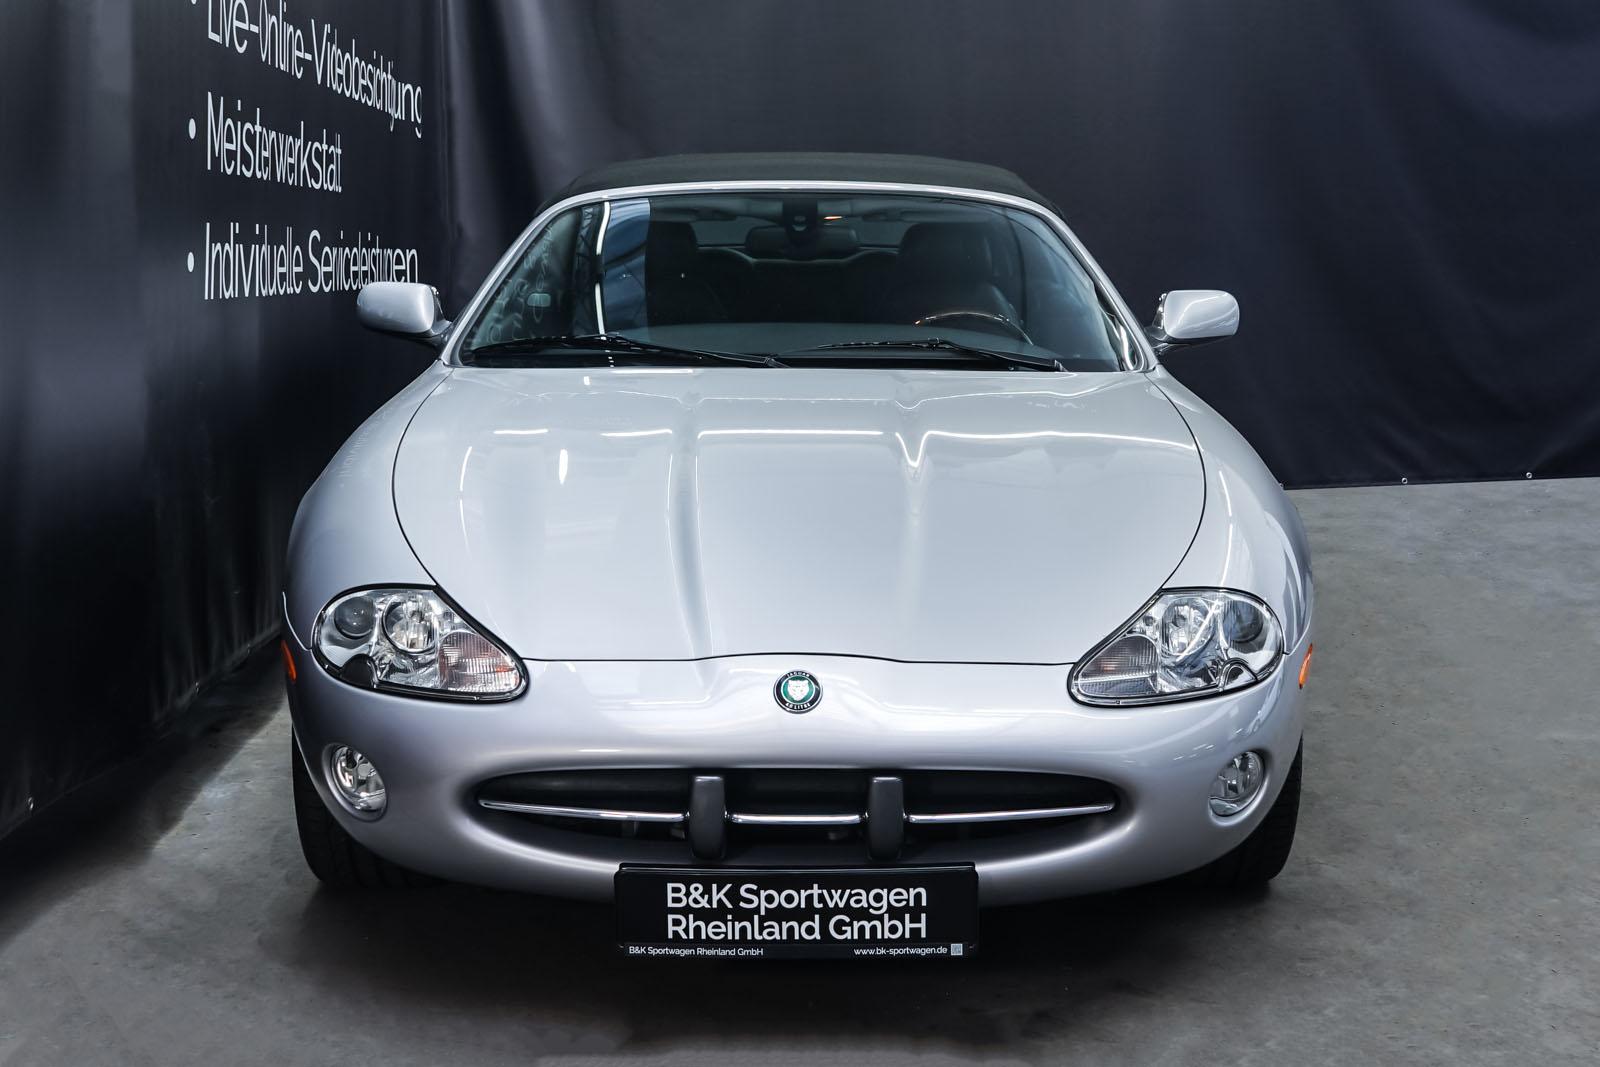 Jaguar_XK8_4.0_Silber_Schwarz_JAG-9731_1_w